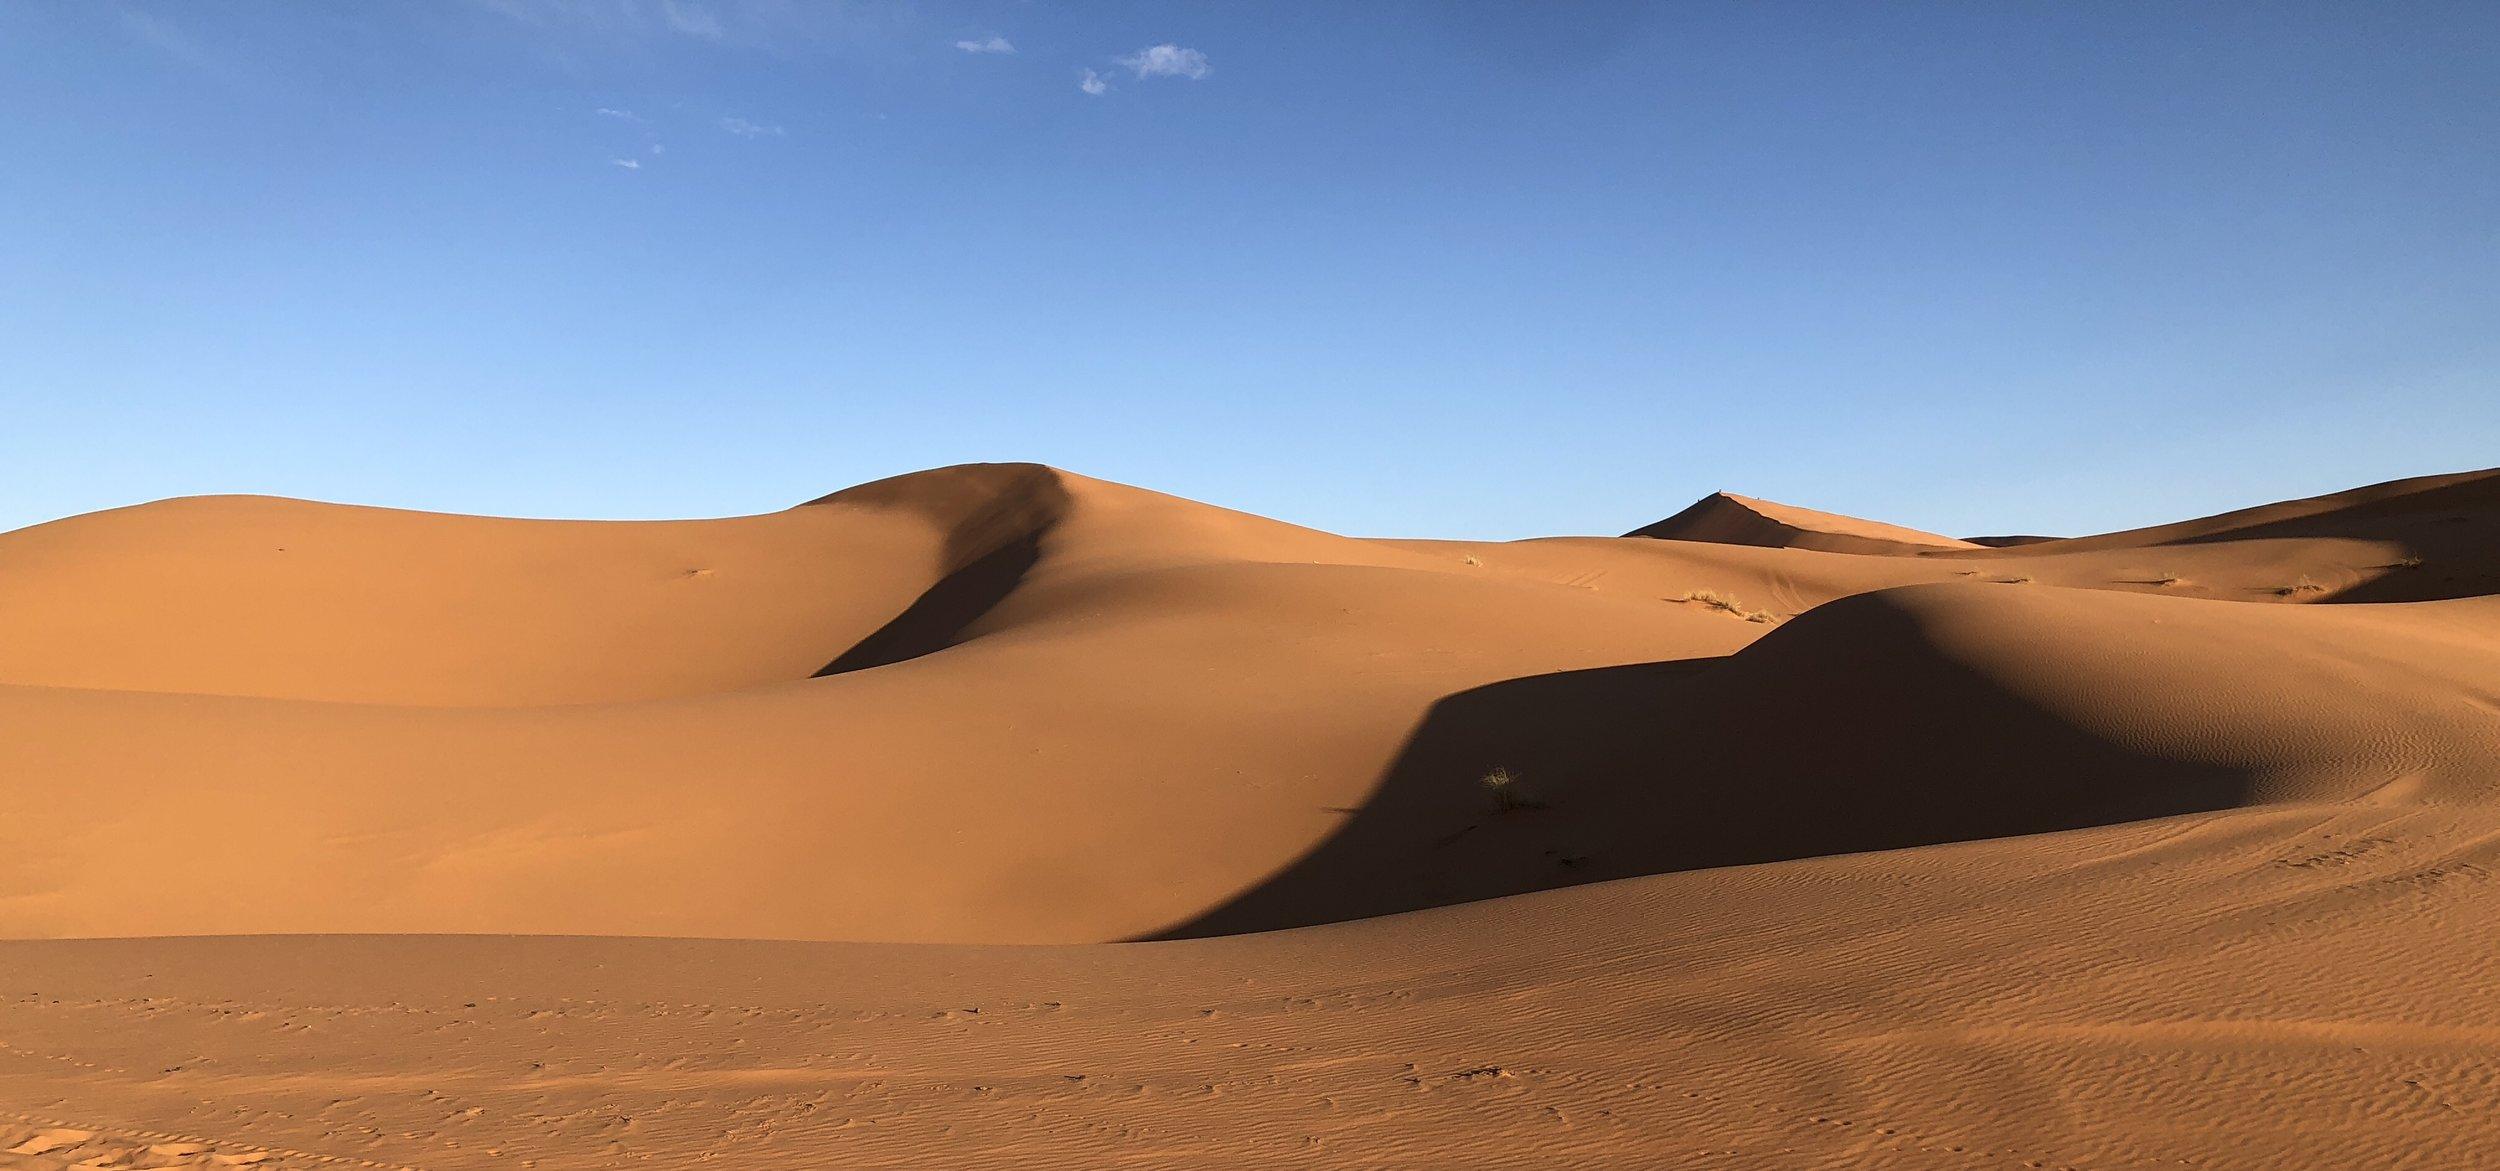 Sand dunes near Merzouga, Sahara Desert.